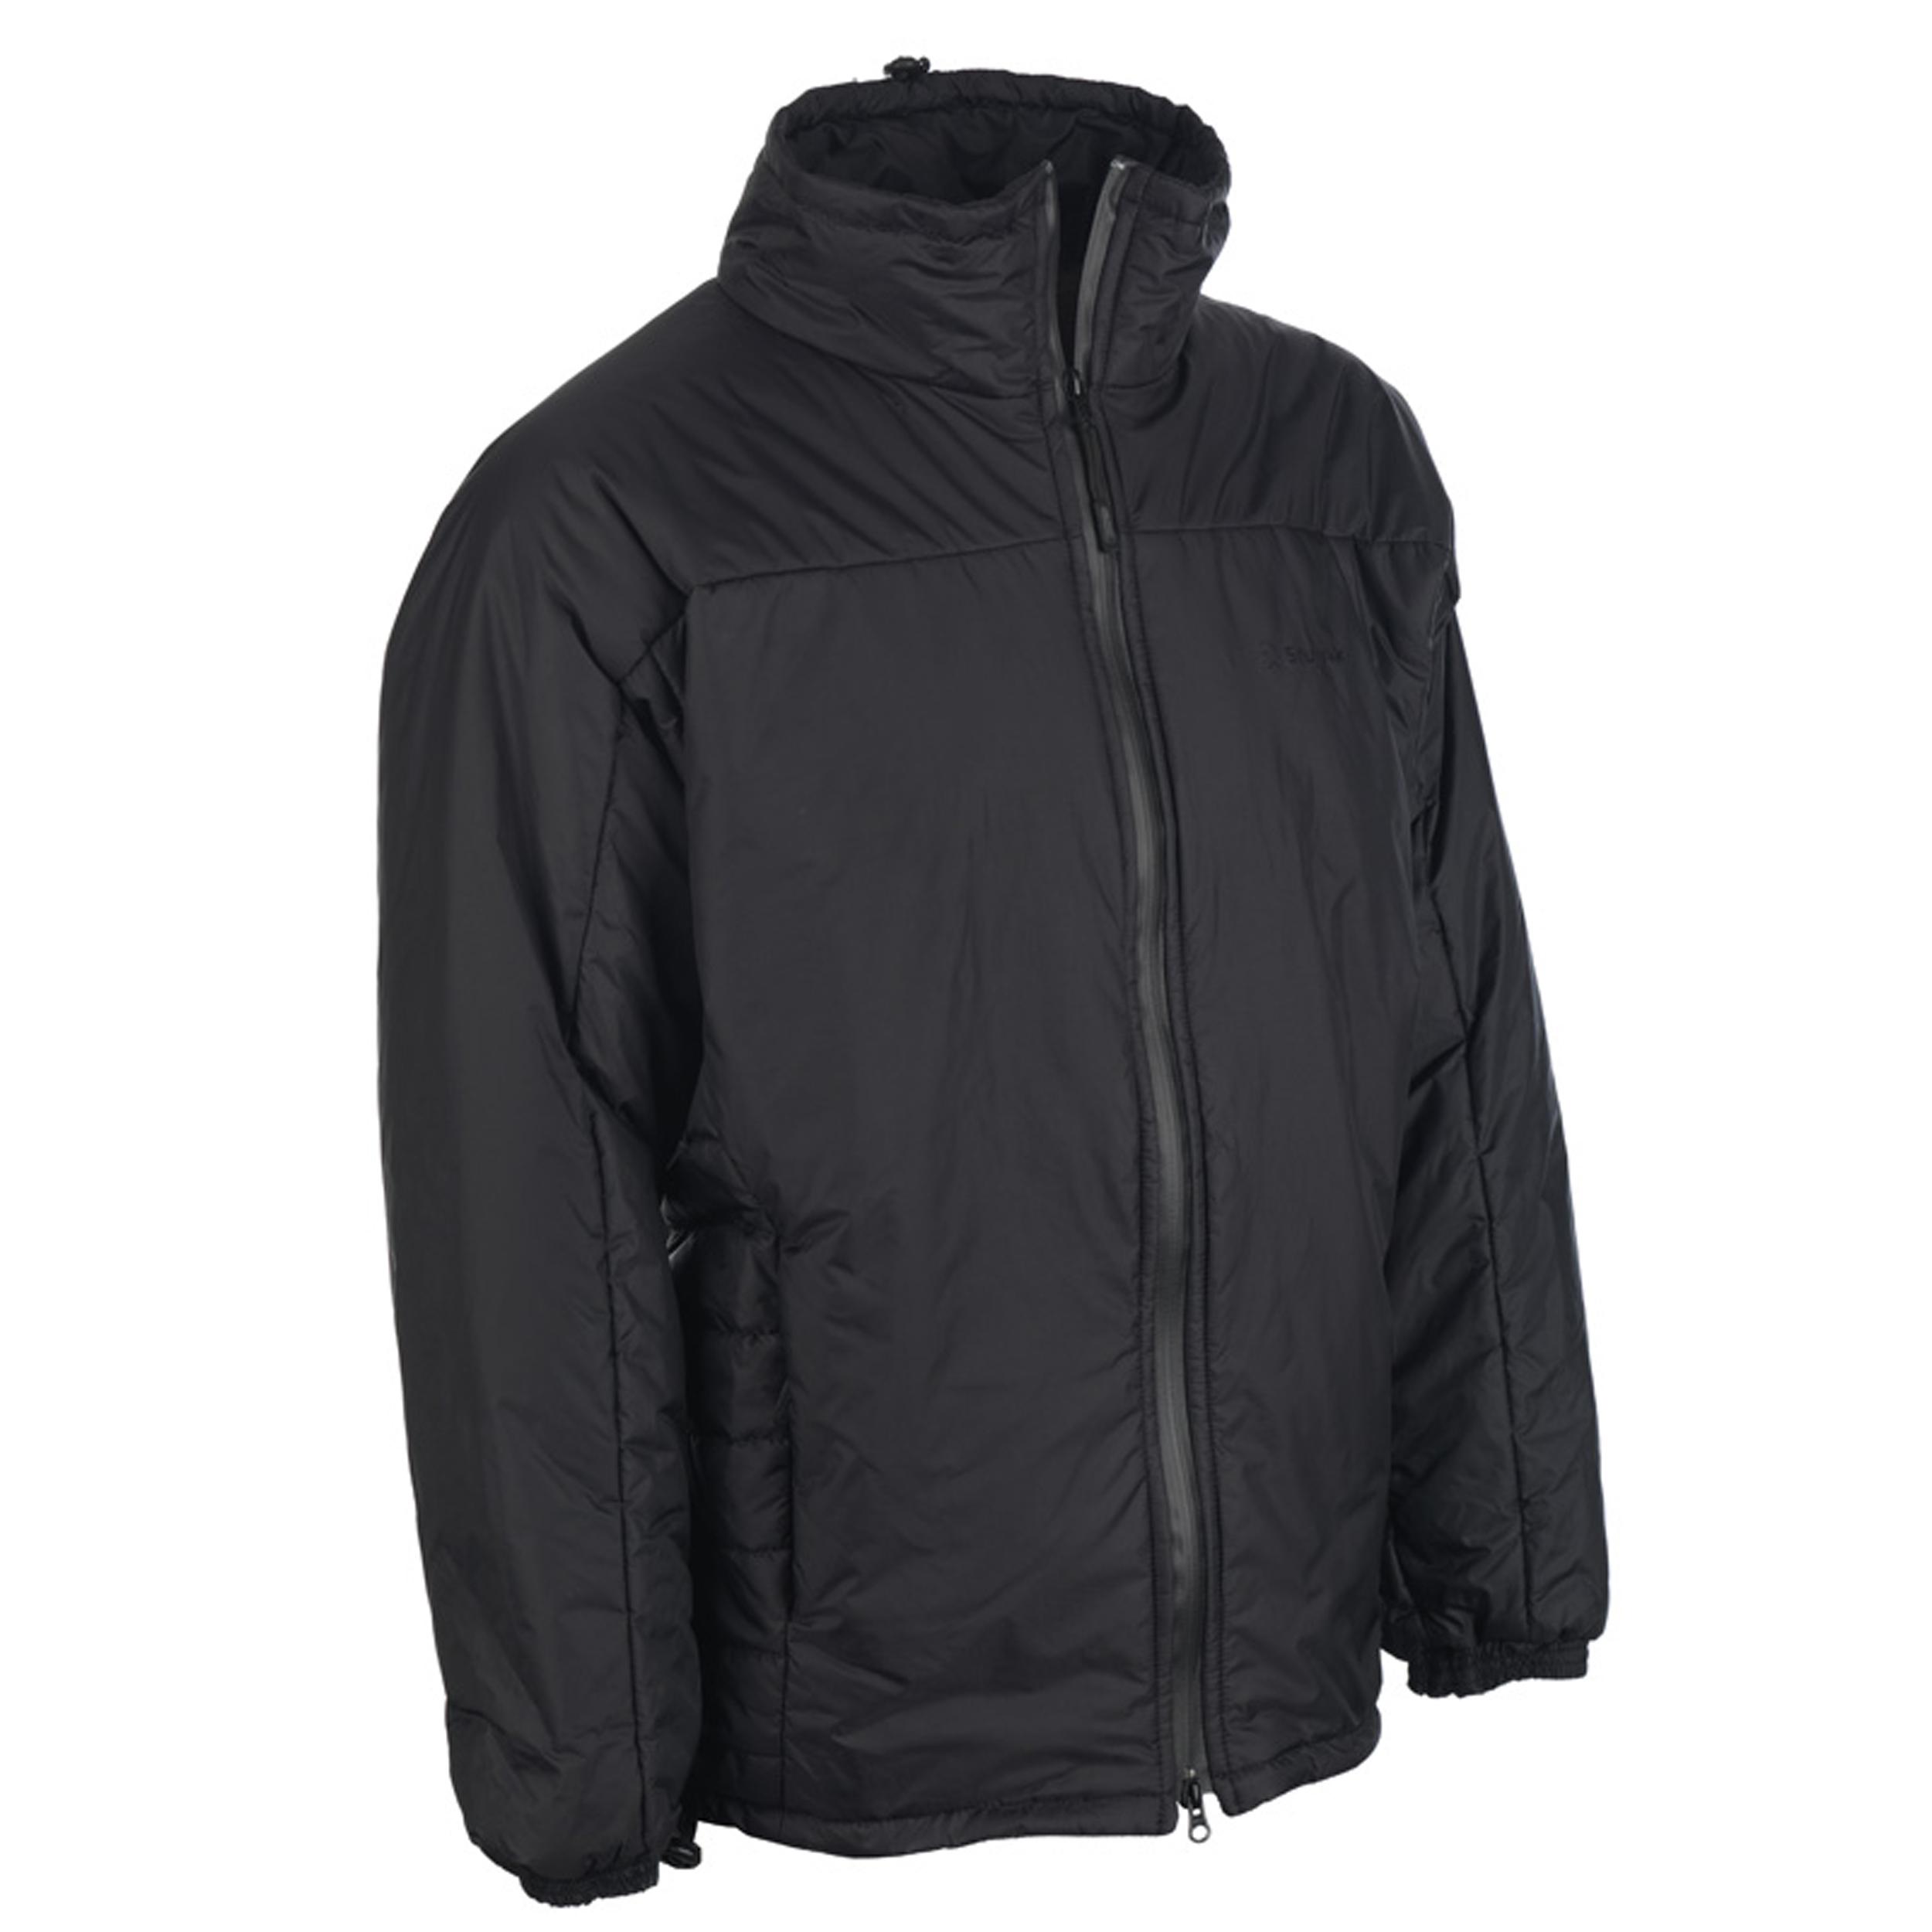 Snugpak Sj3 Jacket Black Xxl